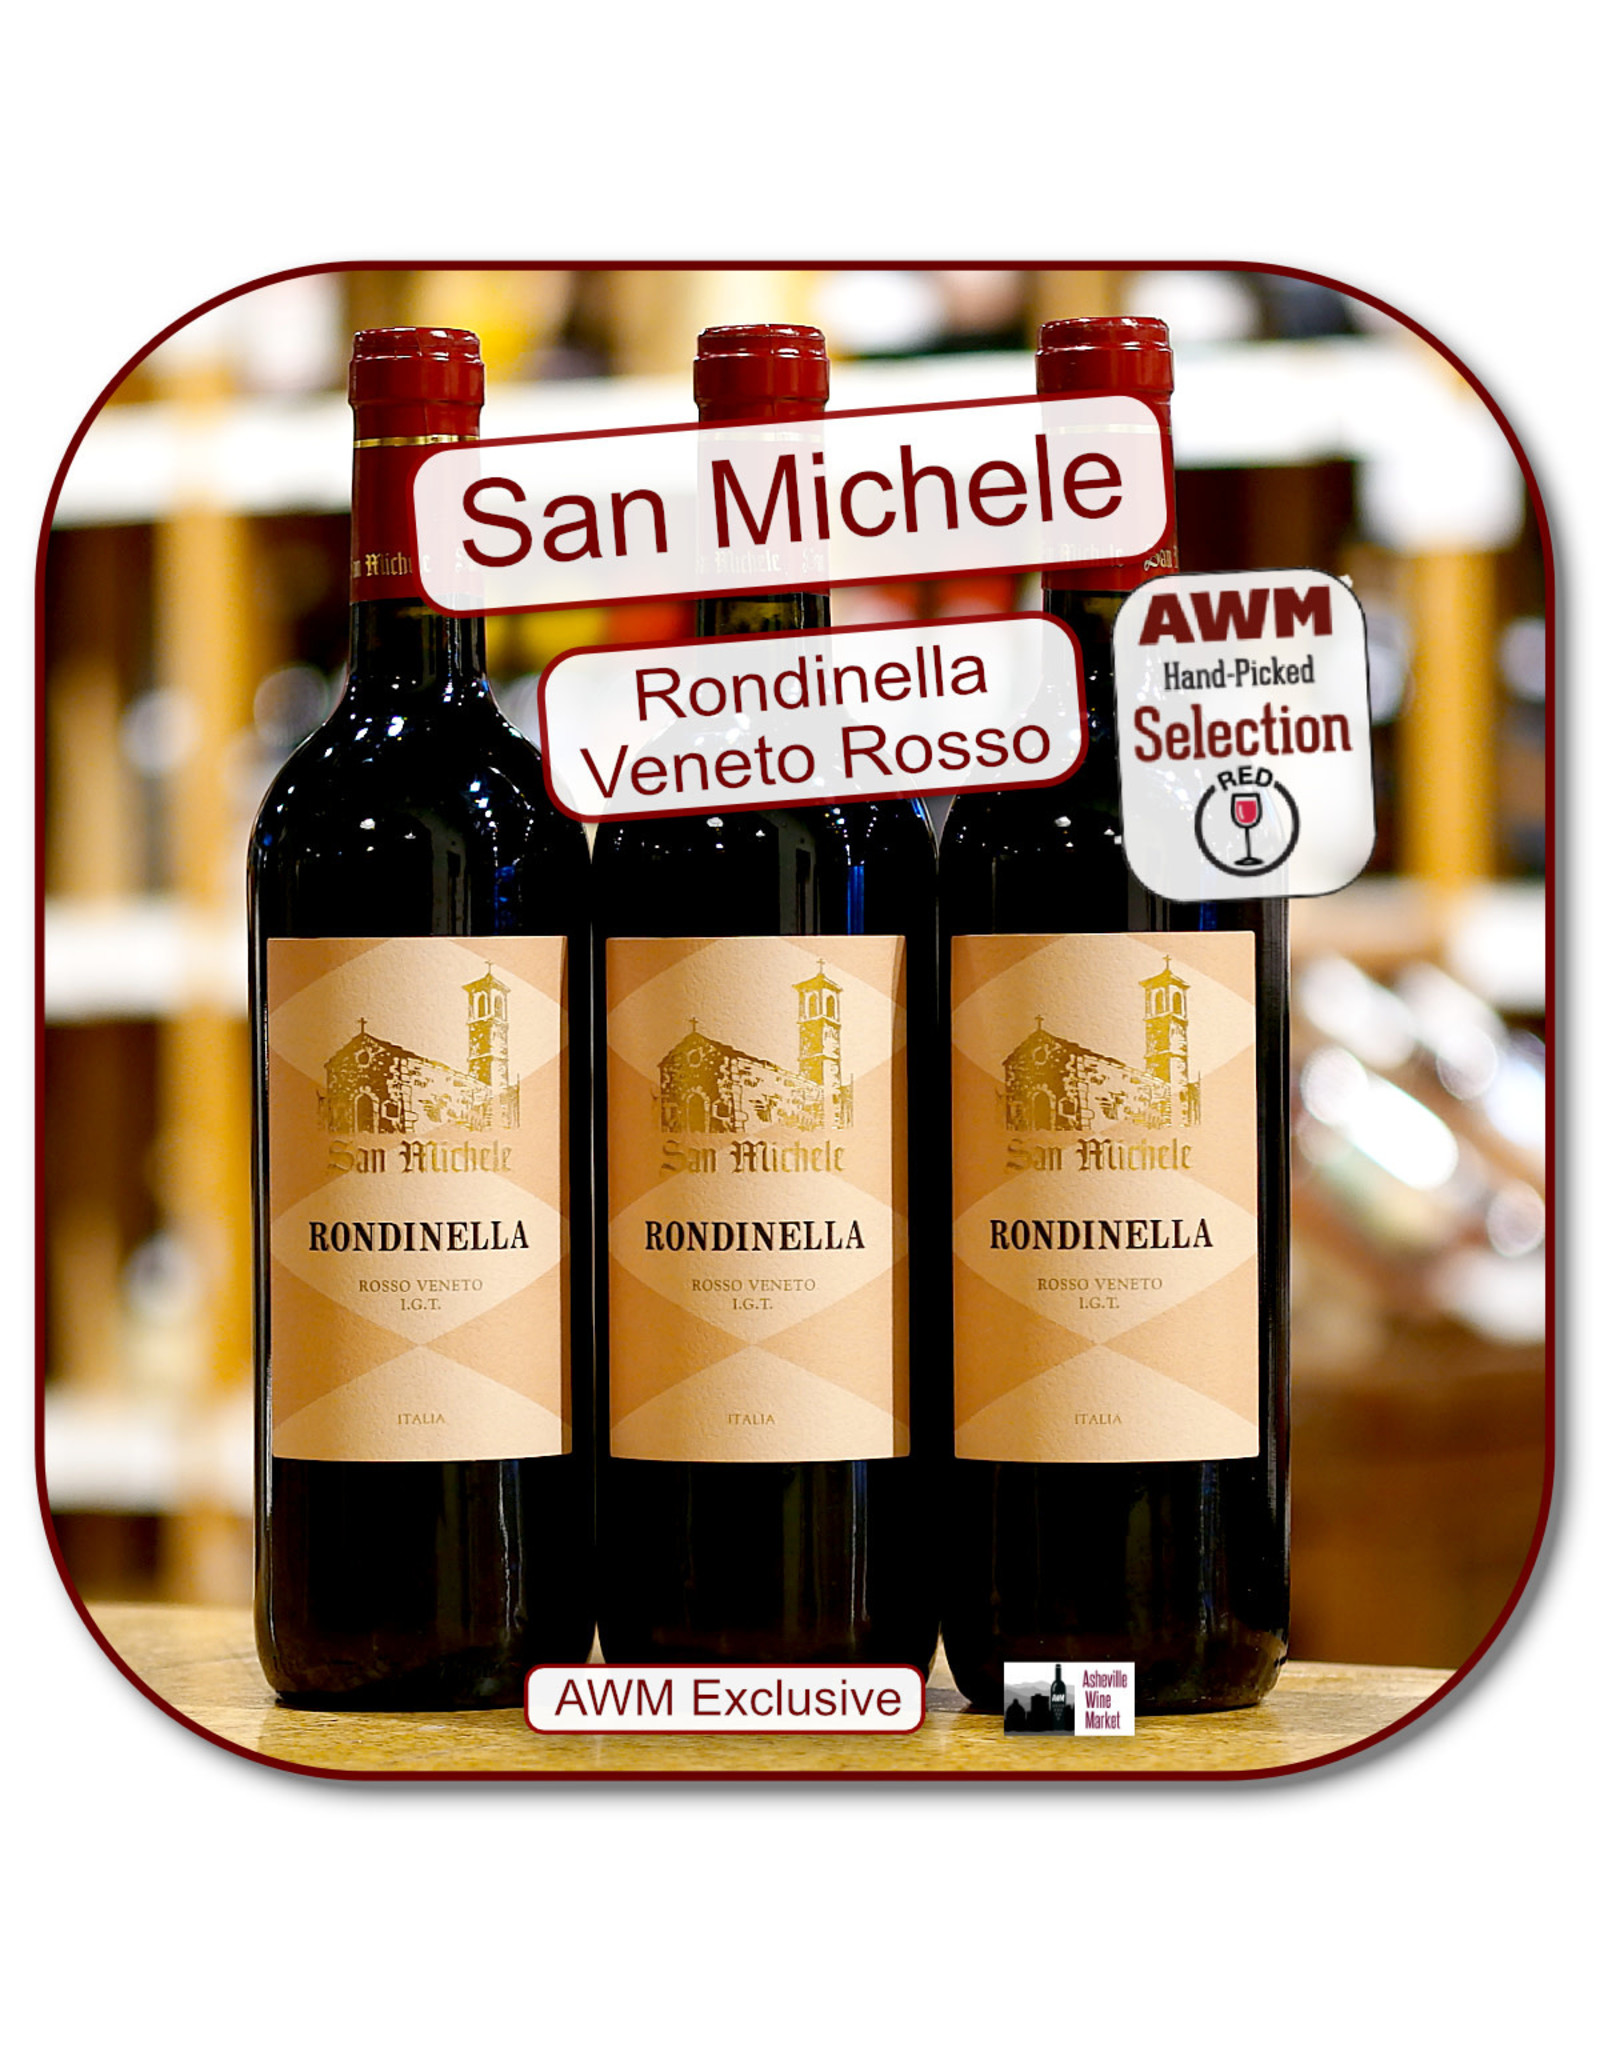 Red Blend - Europe San Michele Rondinella Veneto Rosso 18